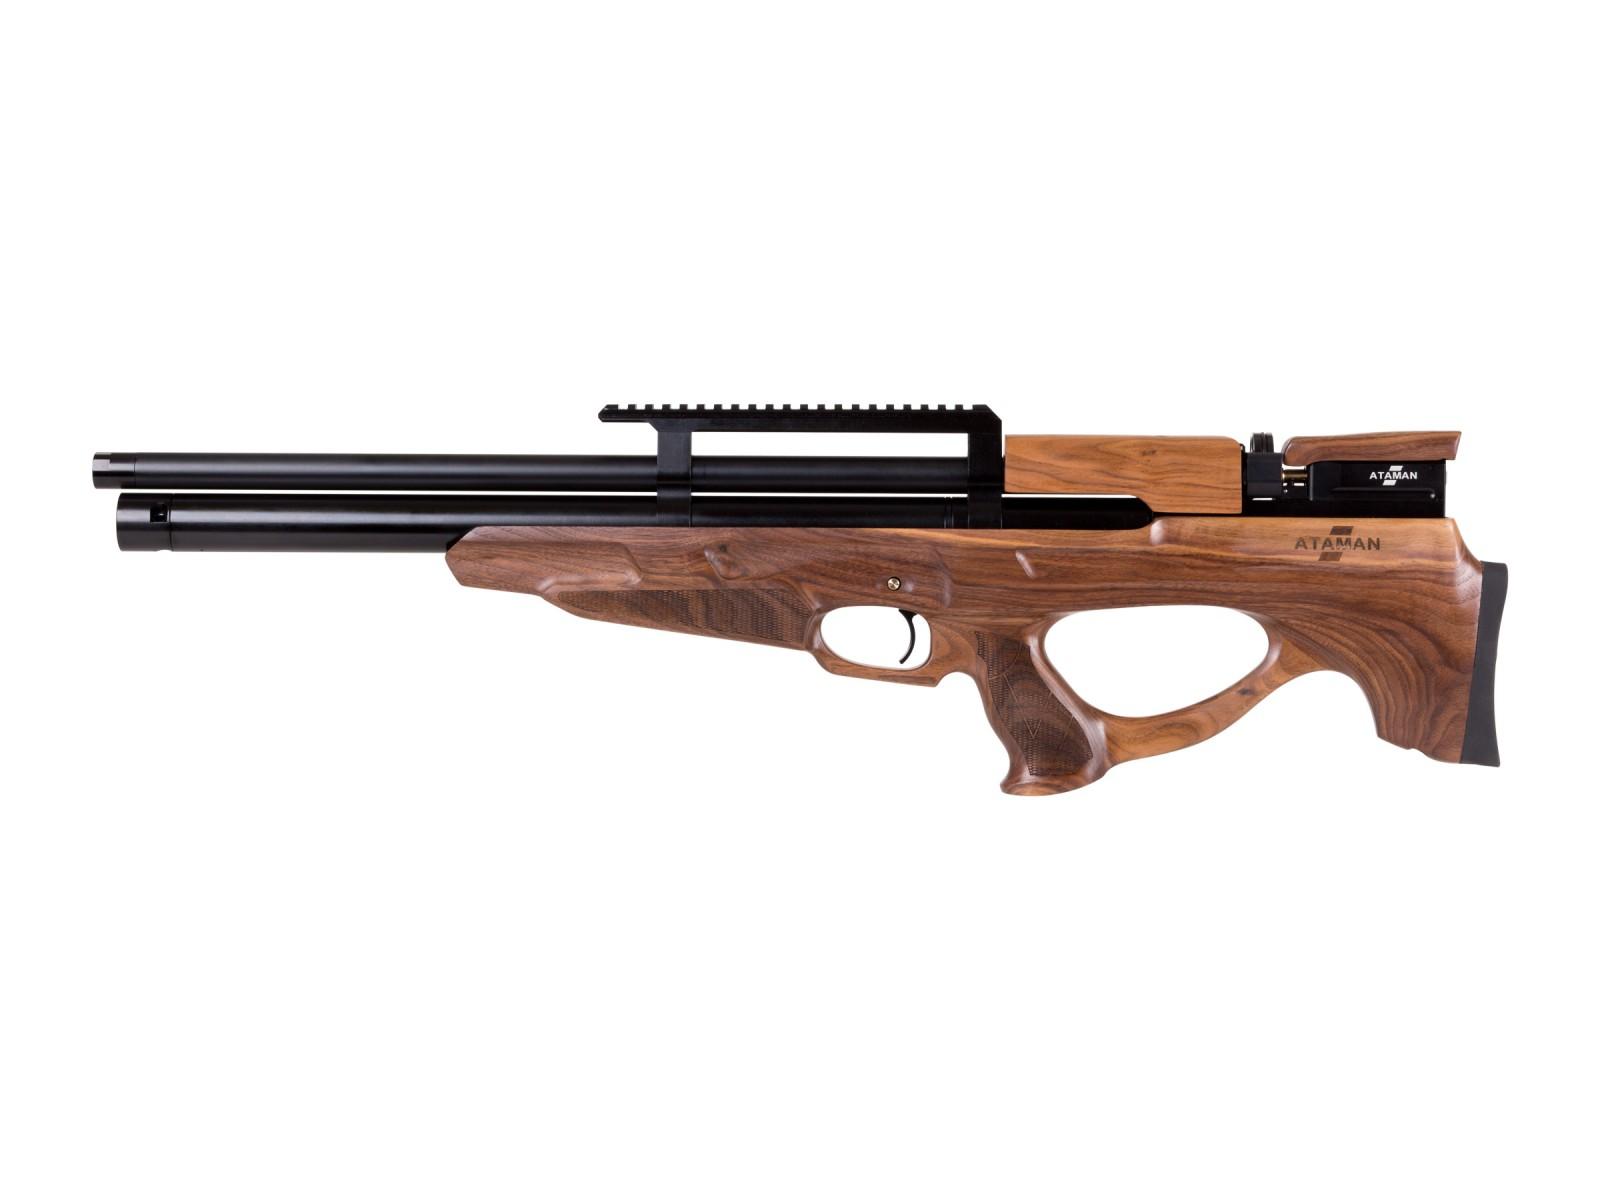 Ataman M2R Bullpup, Type 2, Walnut Stock Air Rifle 0.25 Image